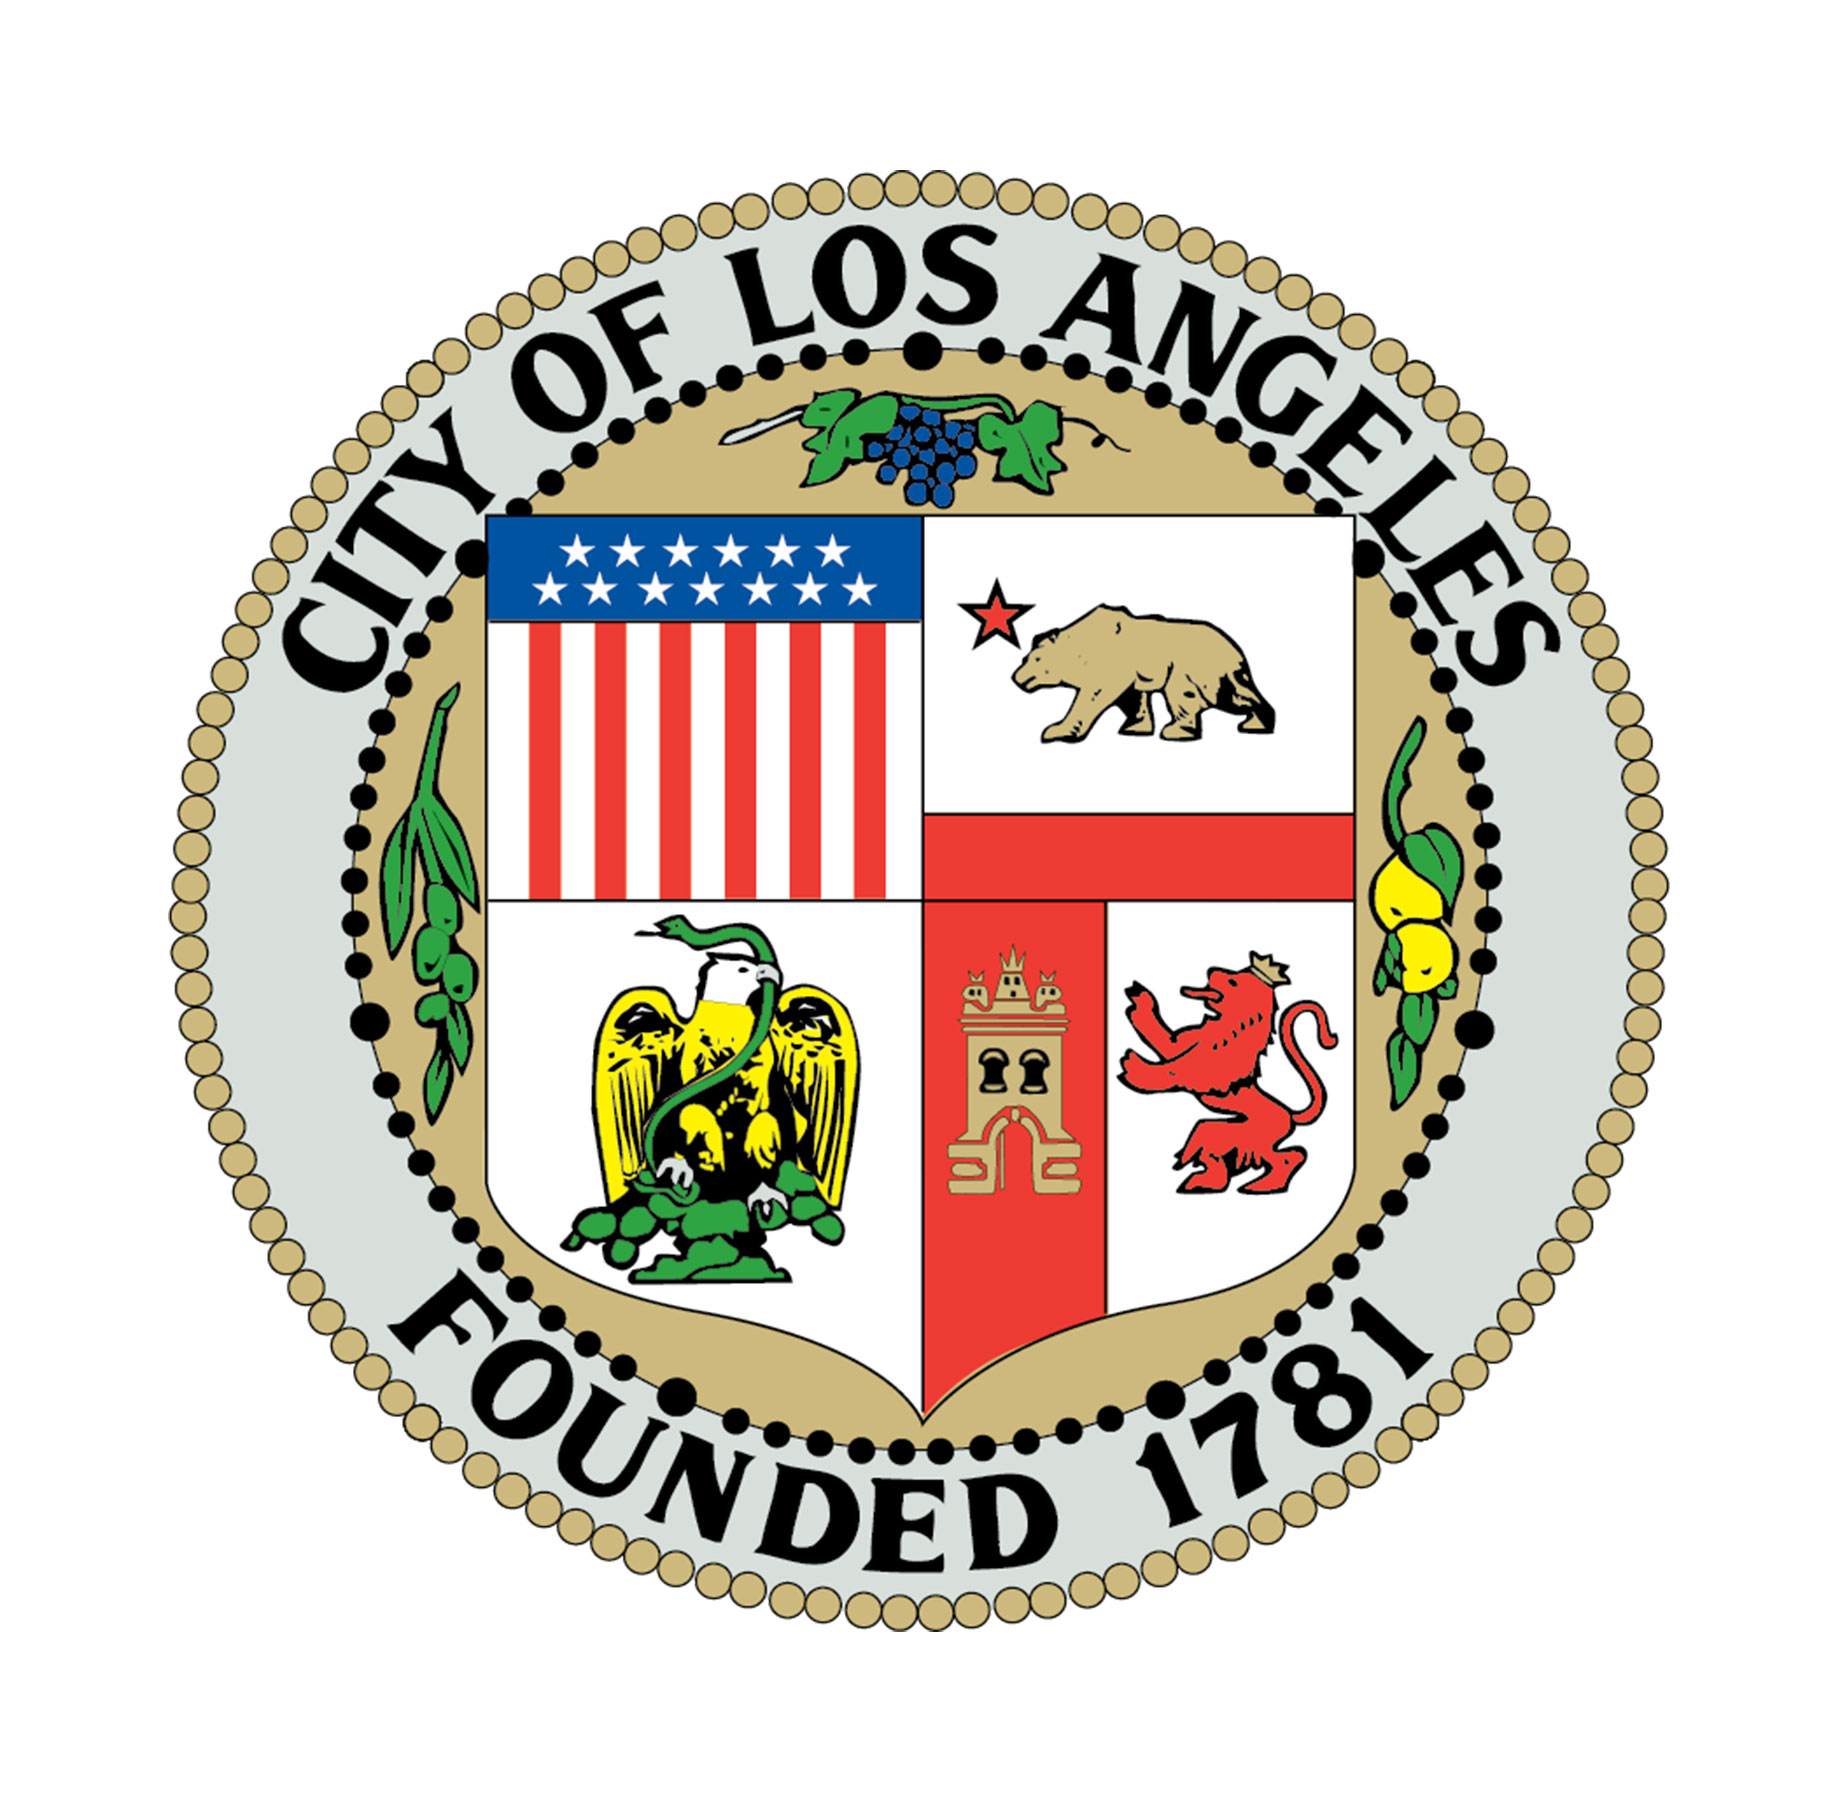 City of LA